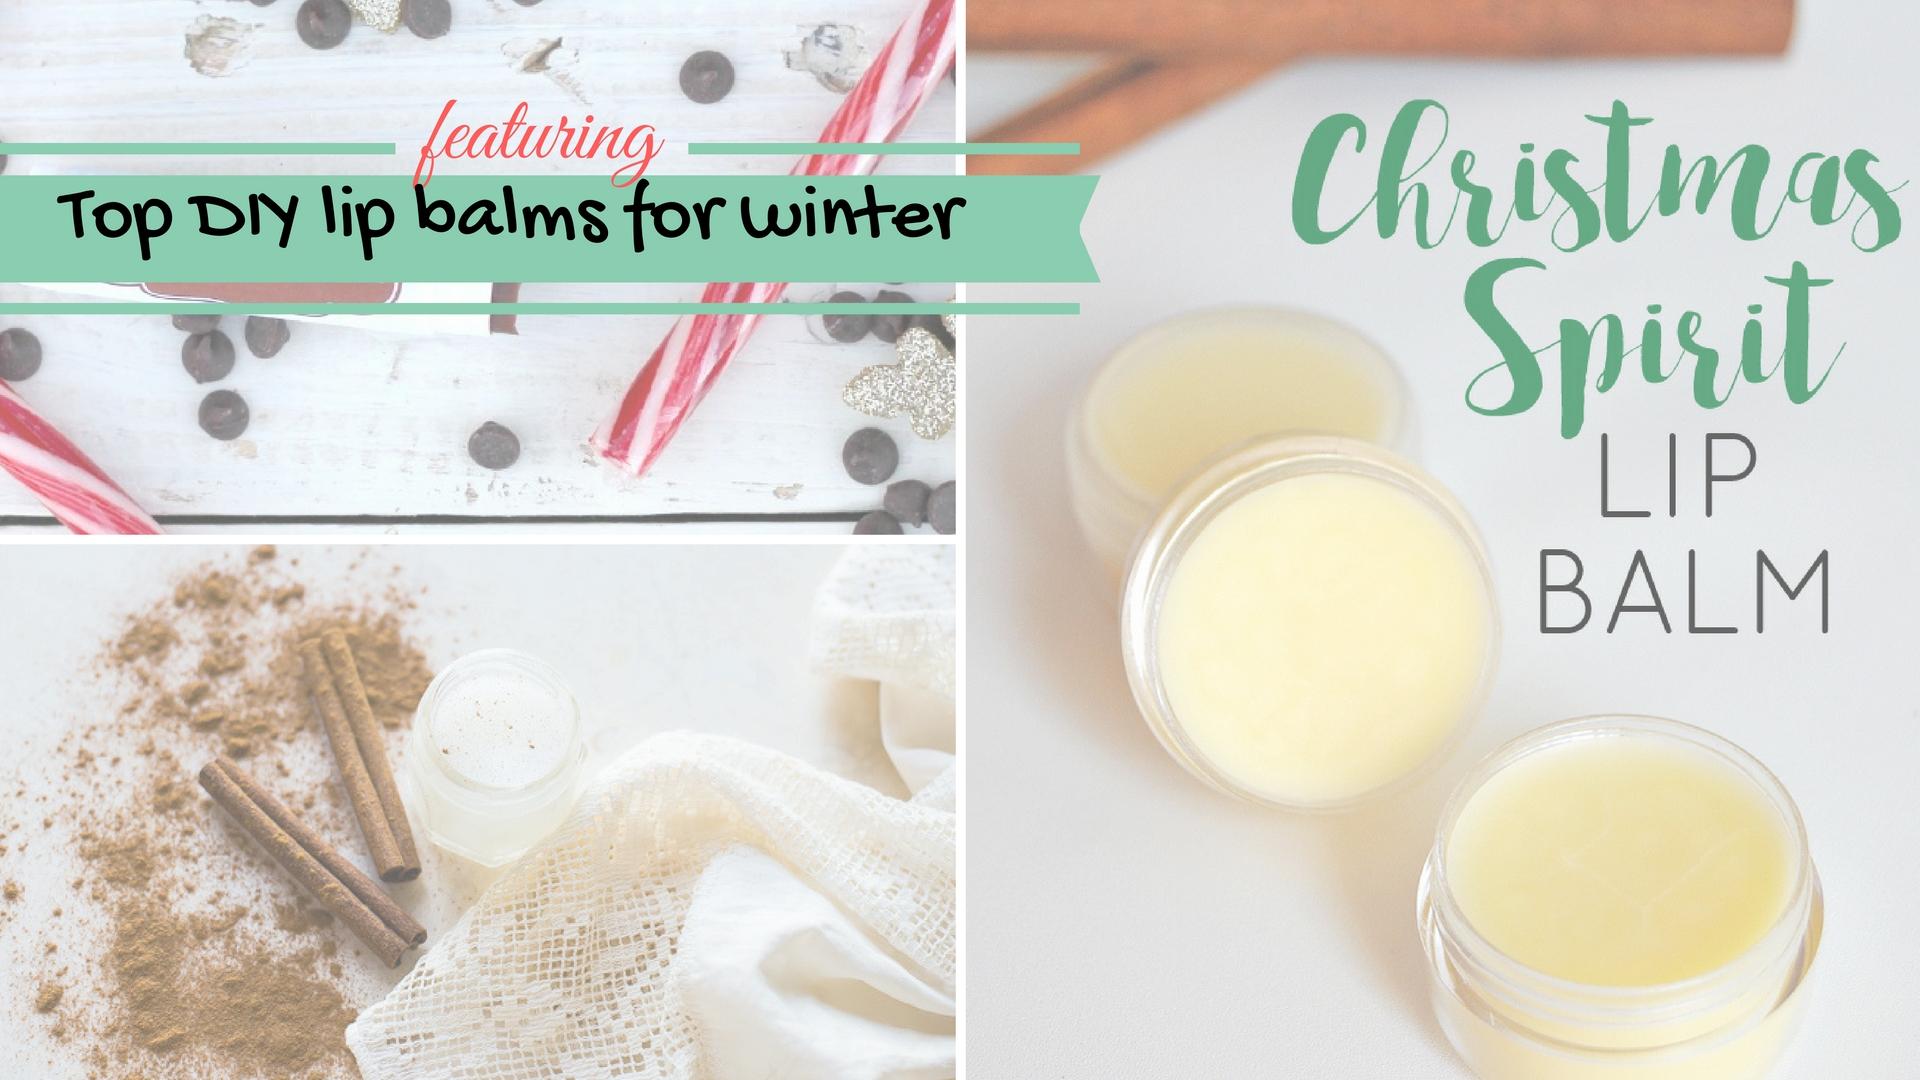 Top DIY lip balms for winter